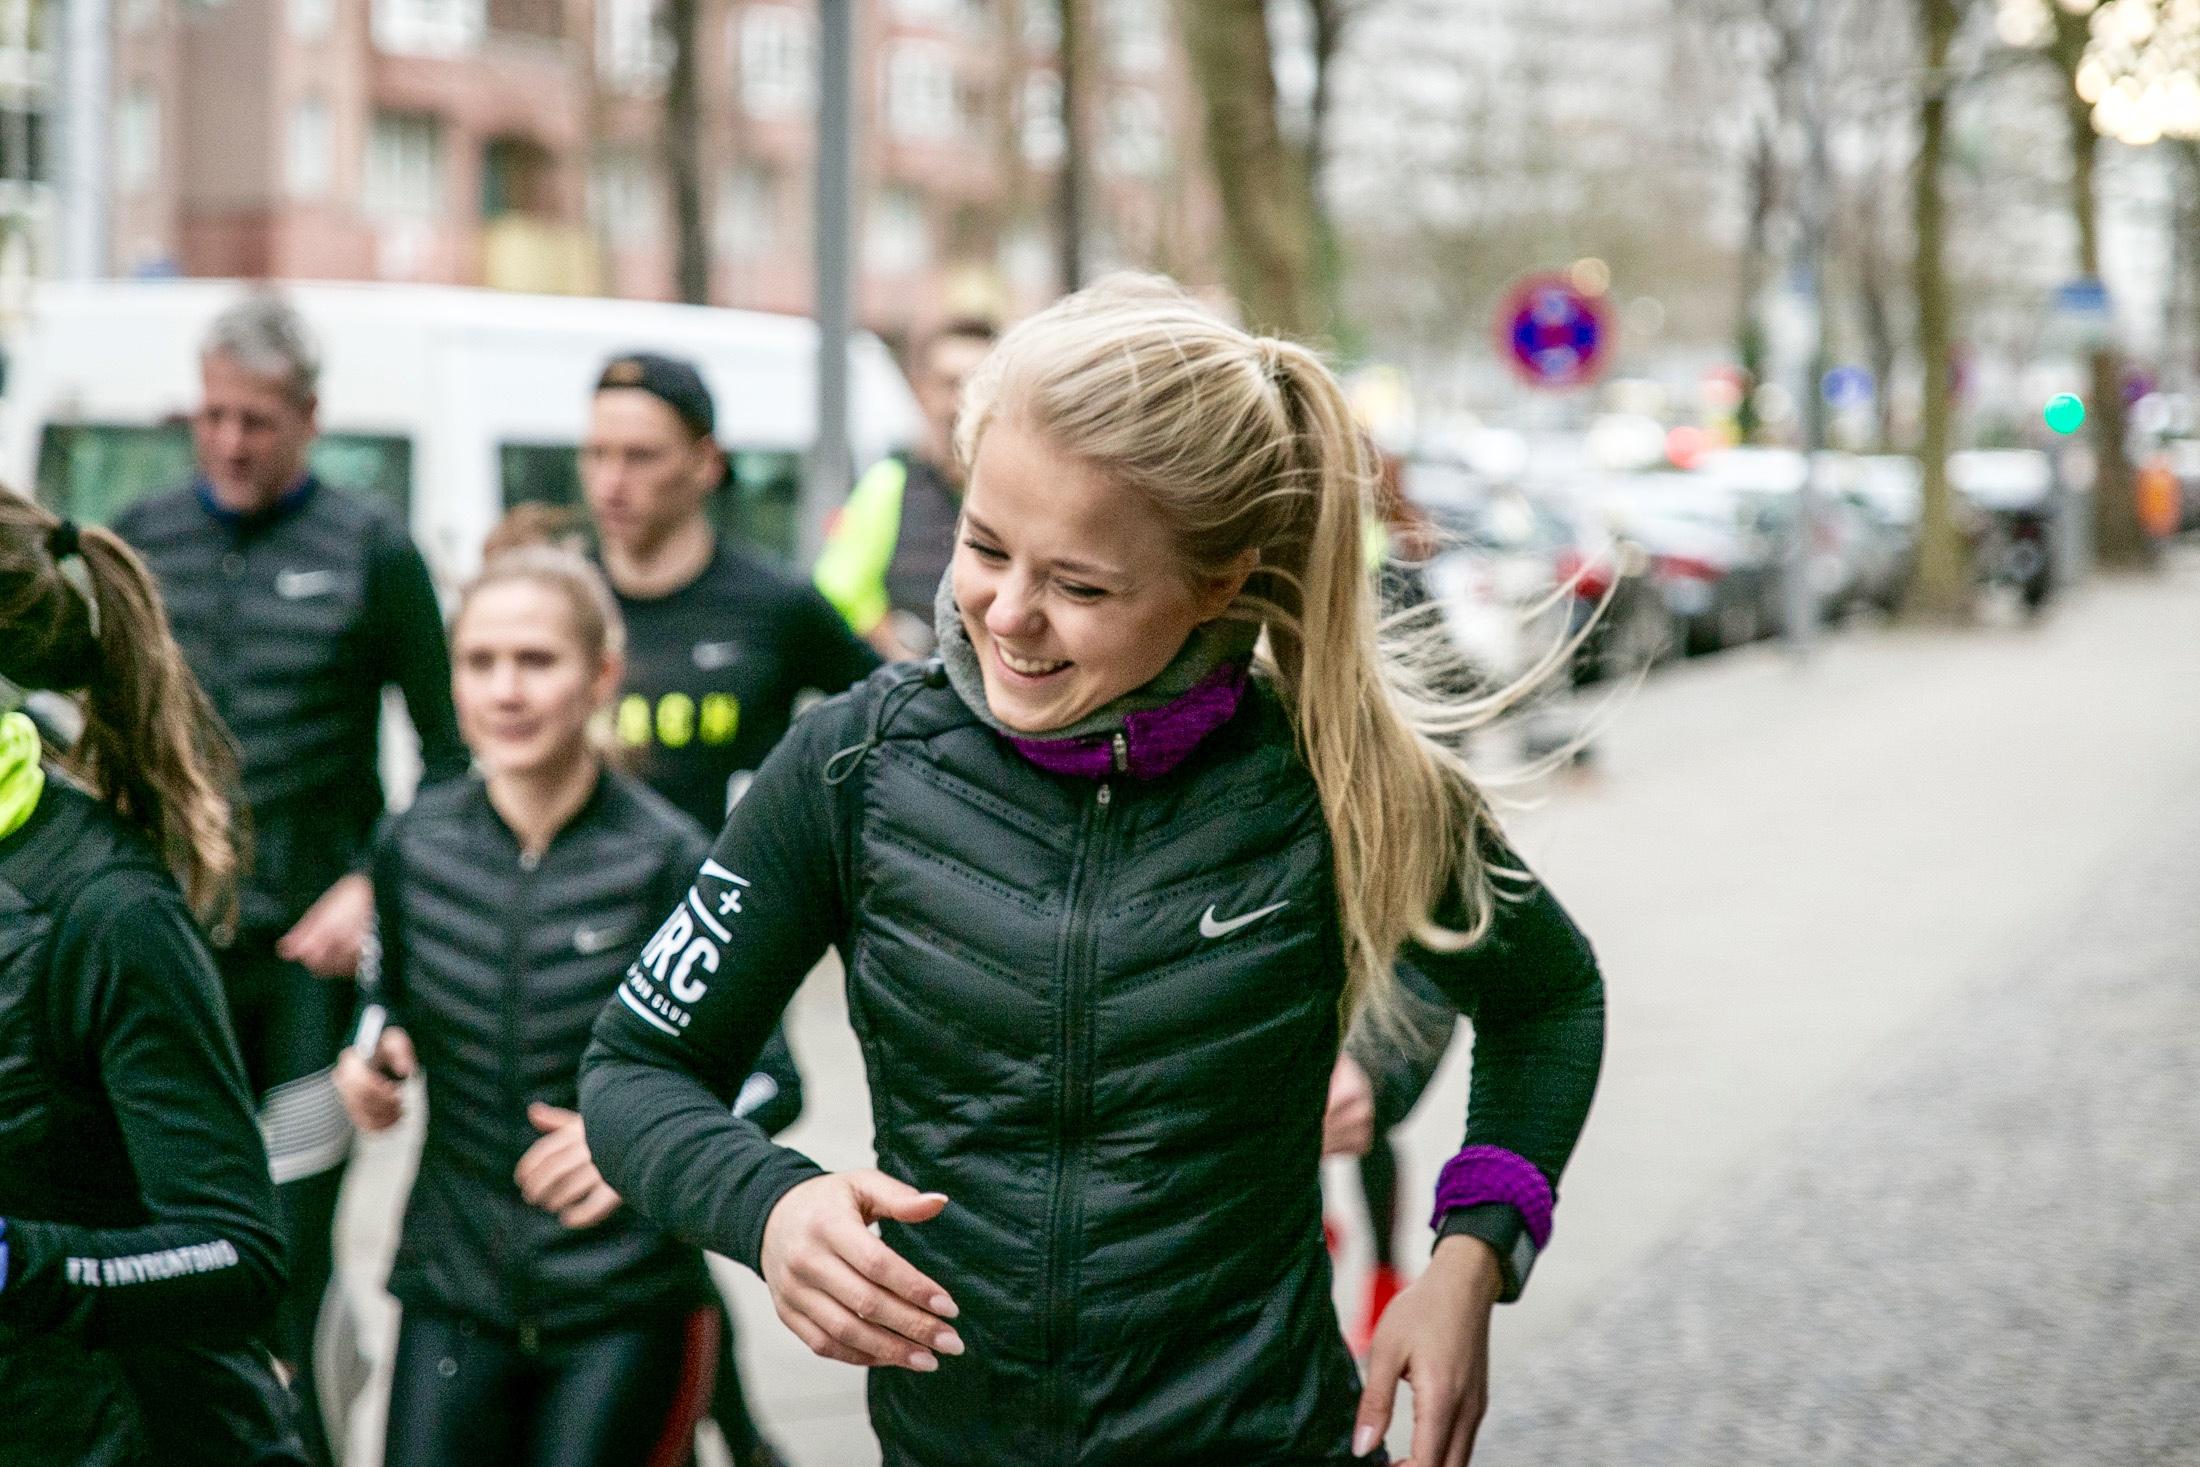 160210_Nike_Berlin_Rio_Medien_Run_035